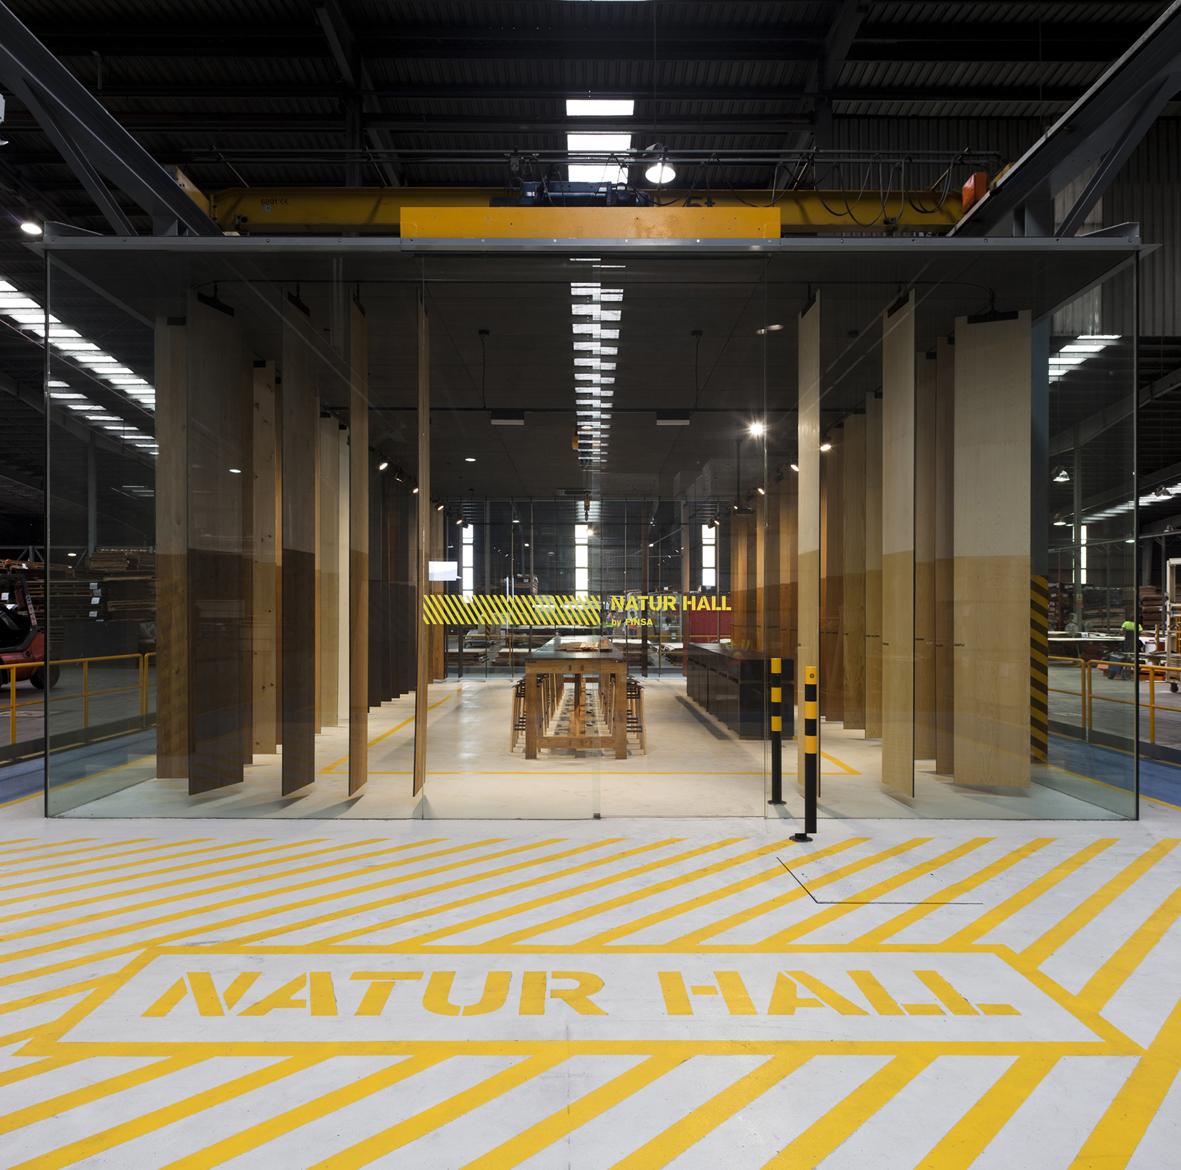 Natur Hall - Espacio expositivo FINSA by Cenlitrosmetrocadrado - Creative Work